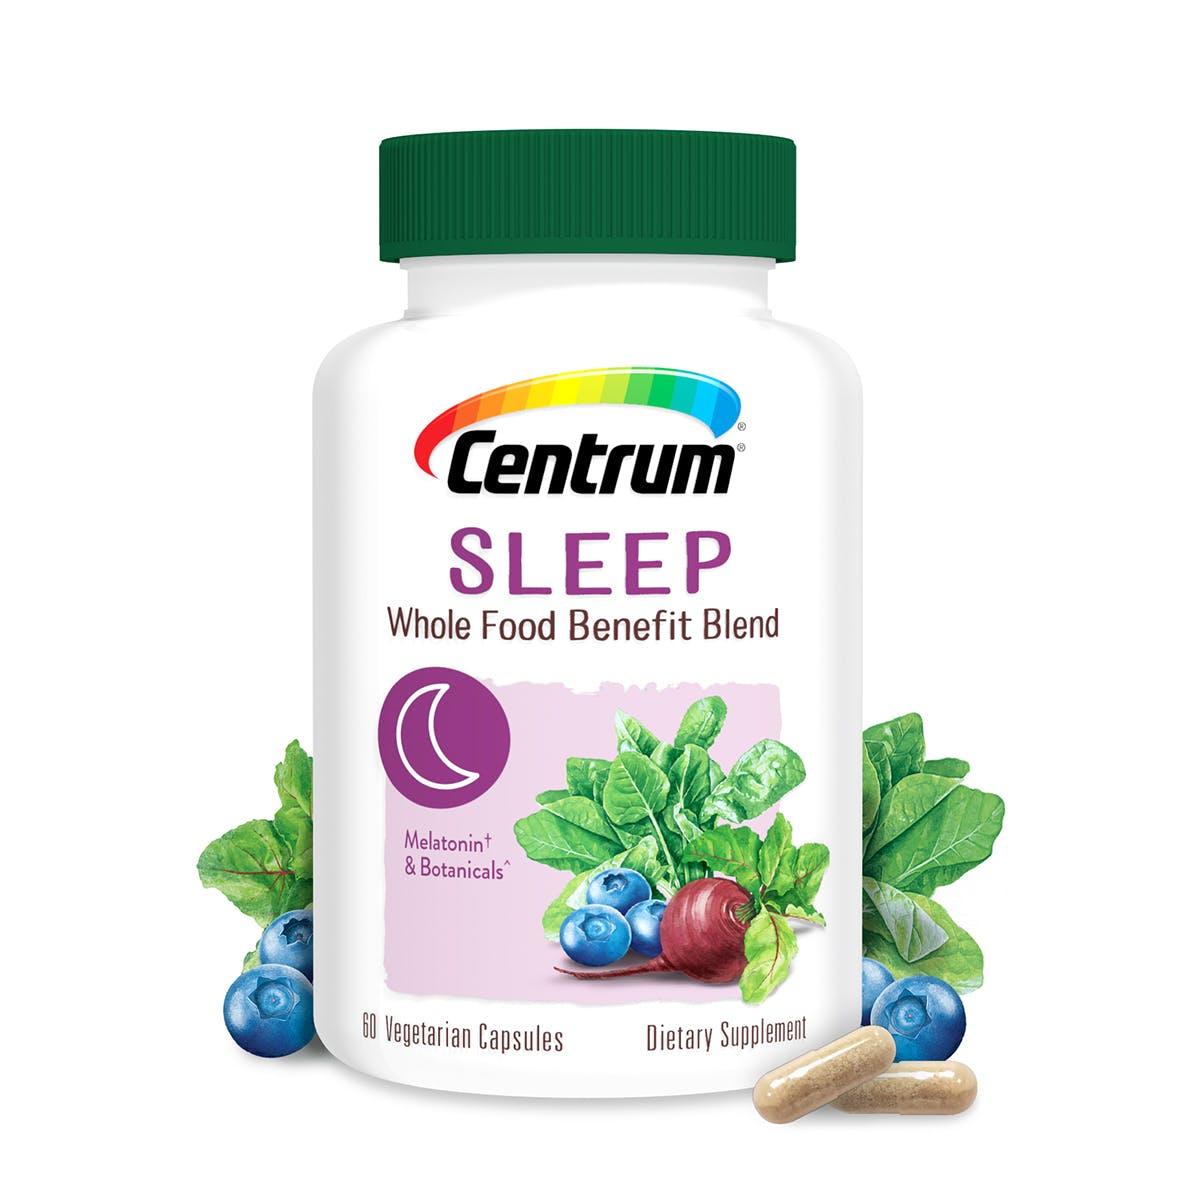 Centrum Sleep Whole Food Blend